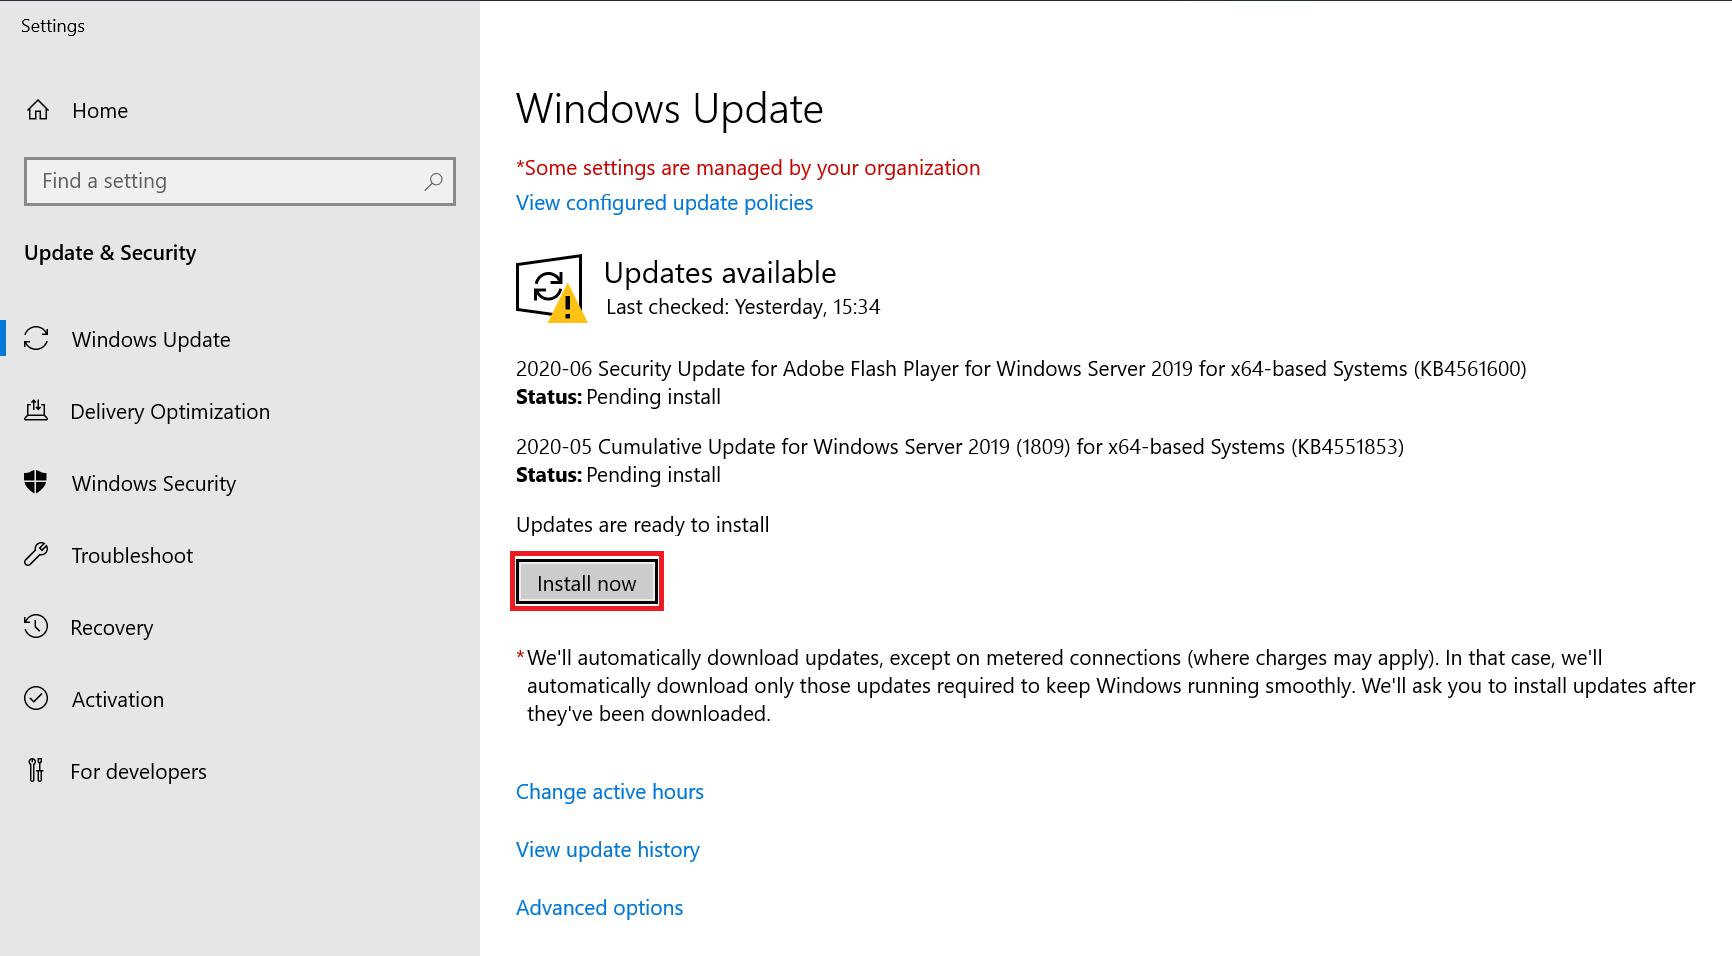 windows update install now